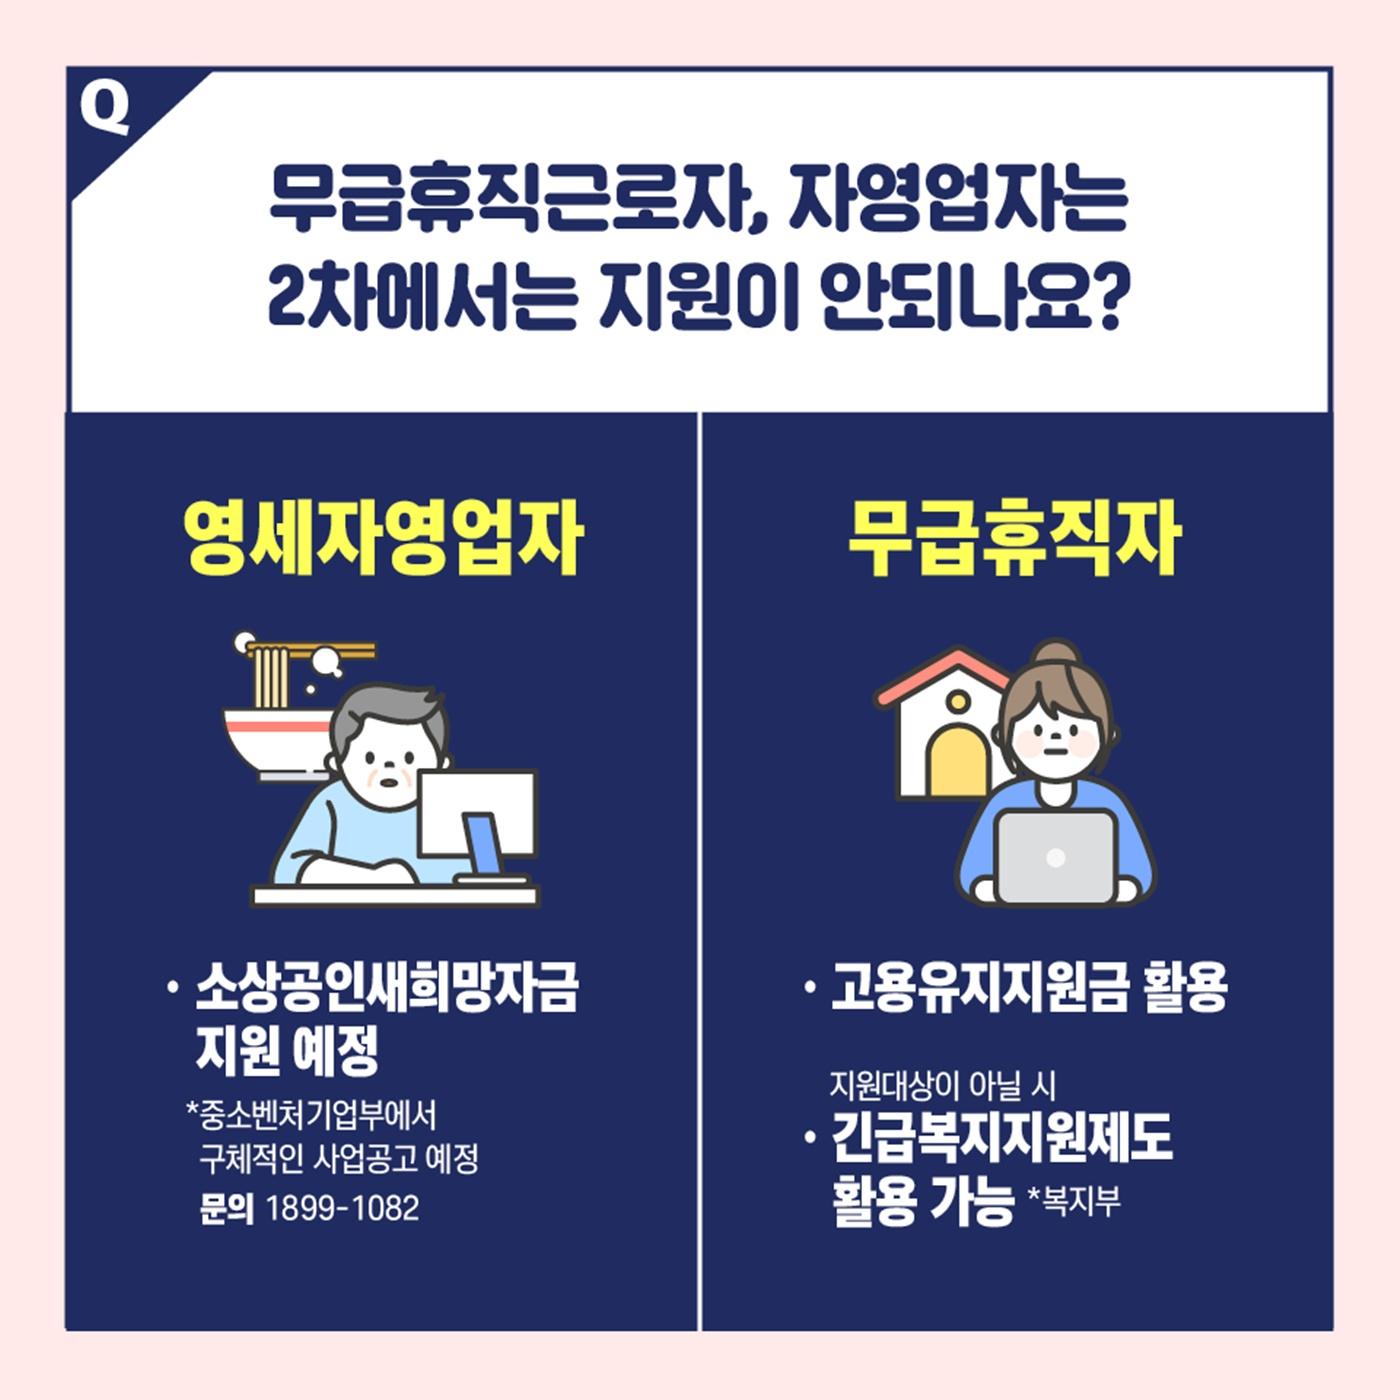 [Q&A] 2차 긴급고용안정지원금, 신규로 지원받는 사람은?